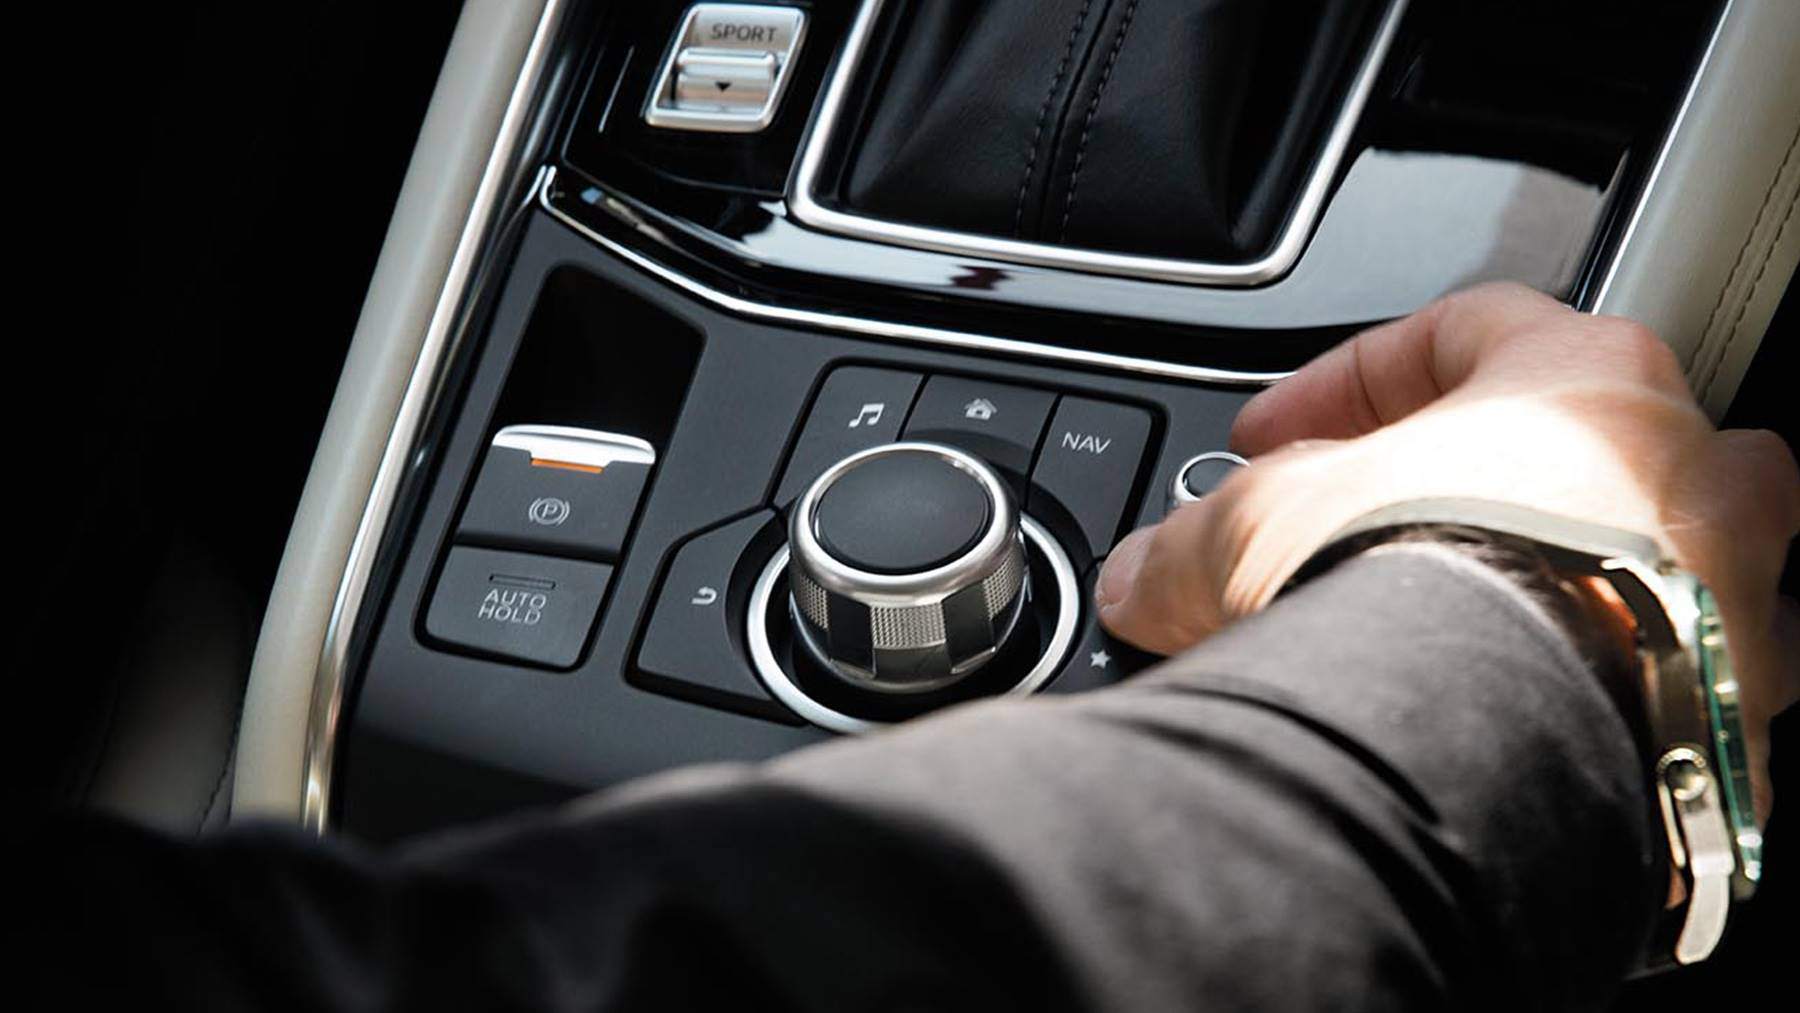 2018 Mazda CX-5 Instrument Panel